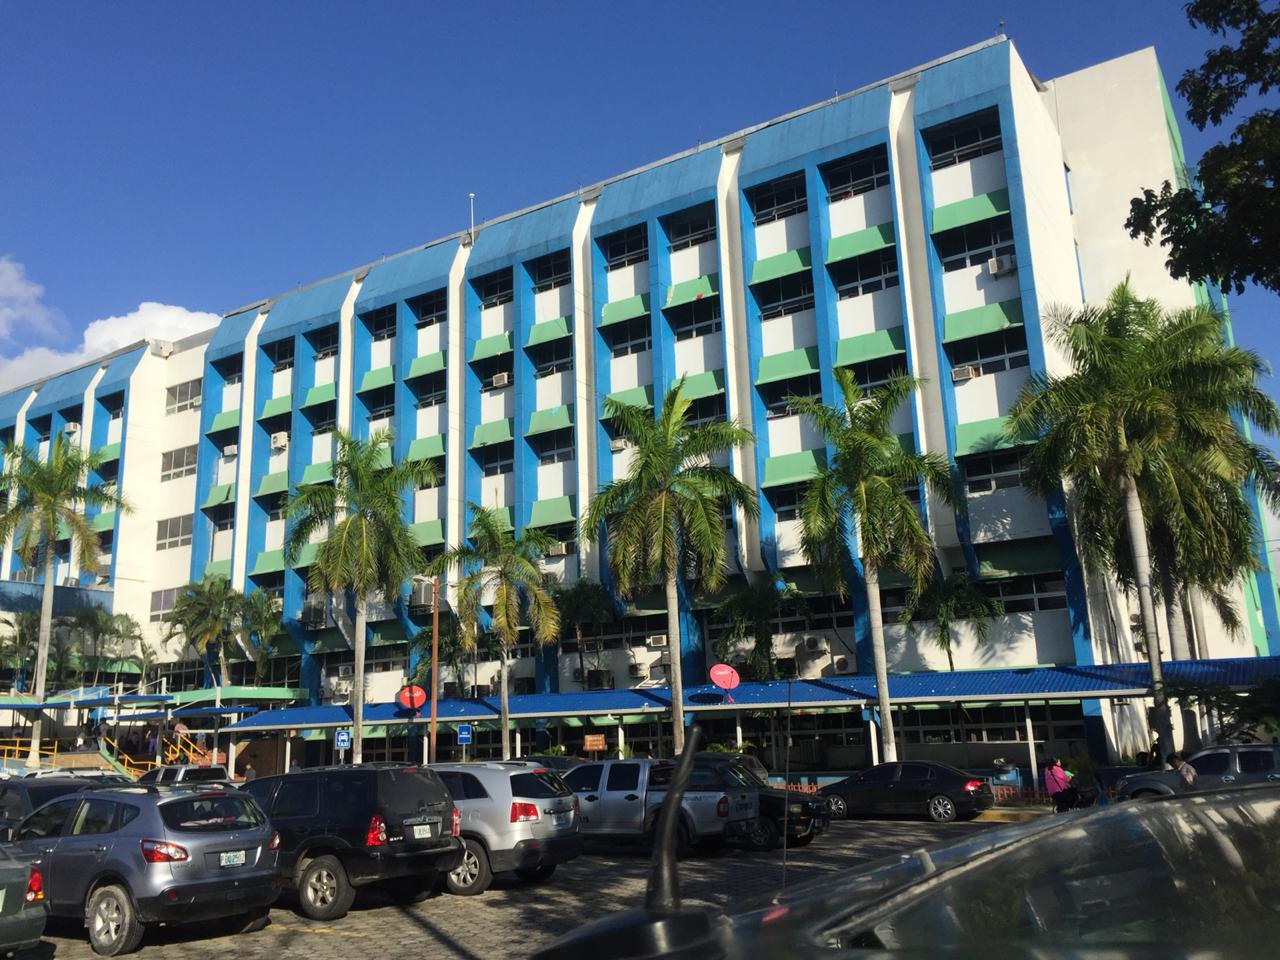 Anuncian intervención al Hospital Mario Catarino Rivas de San Pedro Sula